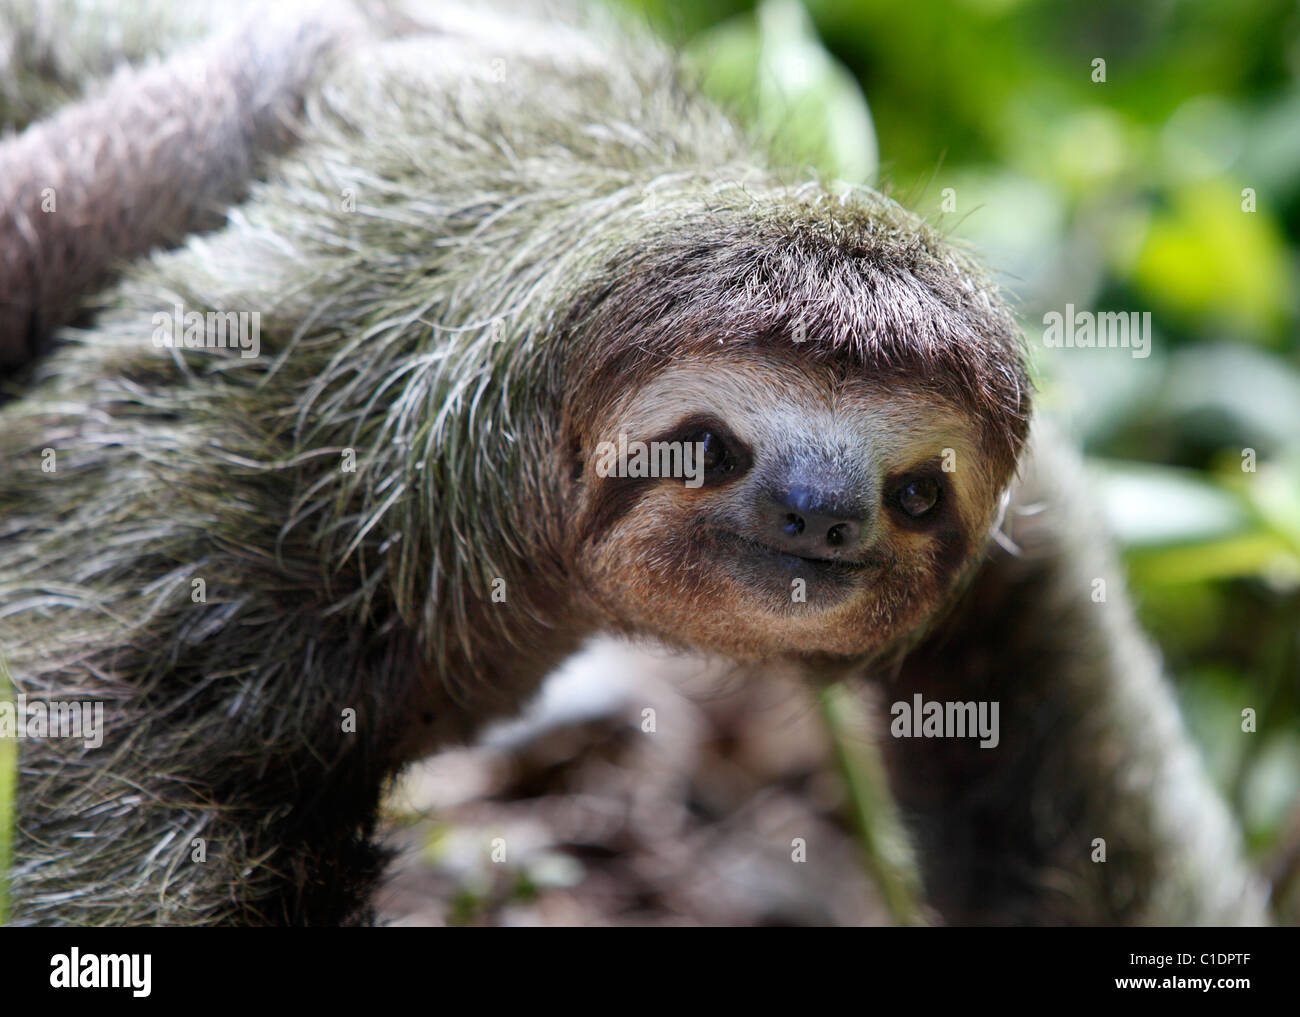 A three-toed sloth moves along the ground, Osa Peninsula, Costa Rica - Stock Image